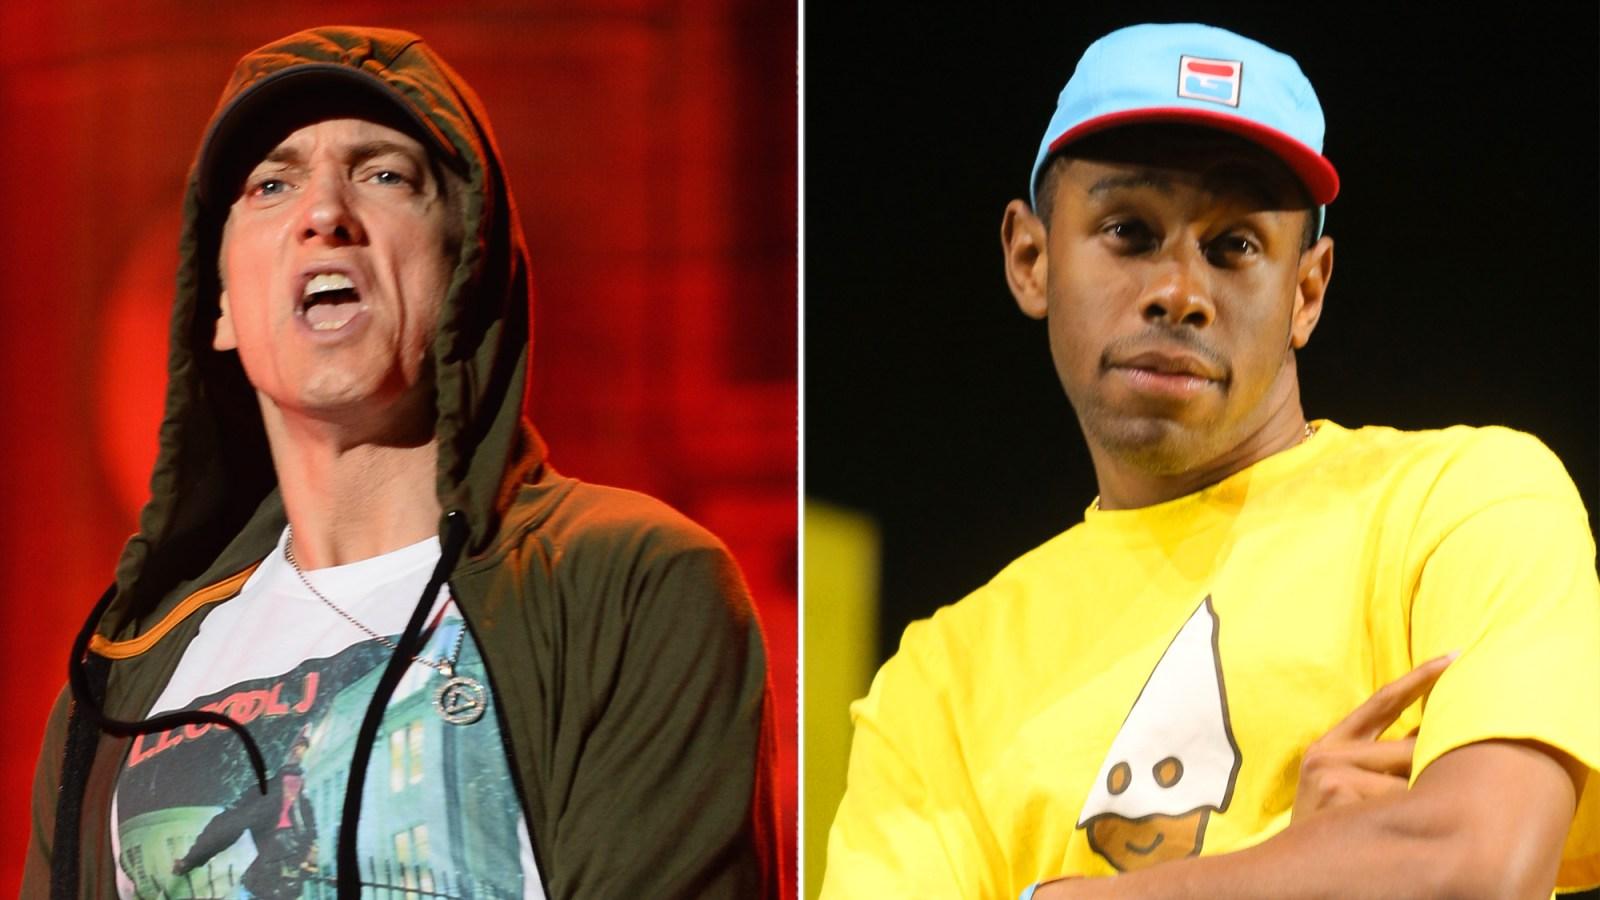 Eminem Slammed for Homophobic Diss About Tyler, The Creator